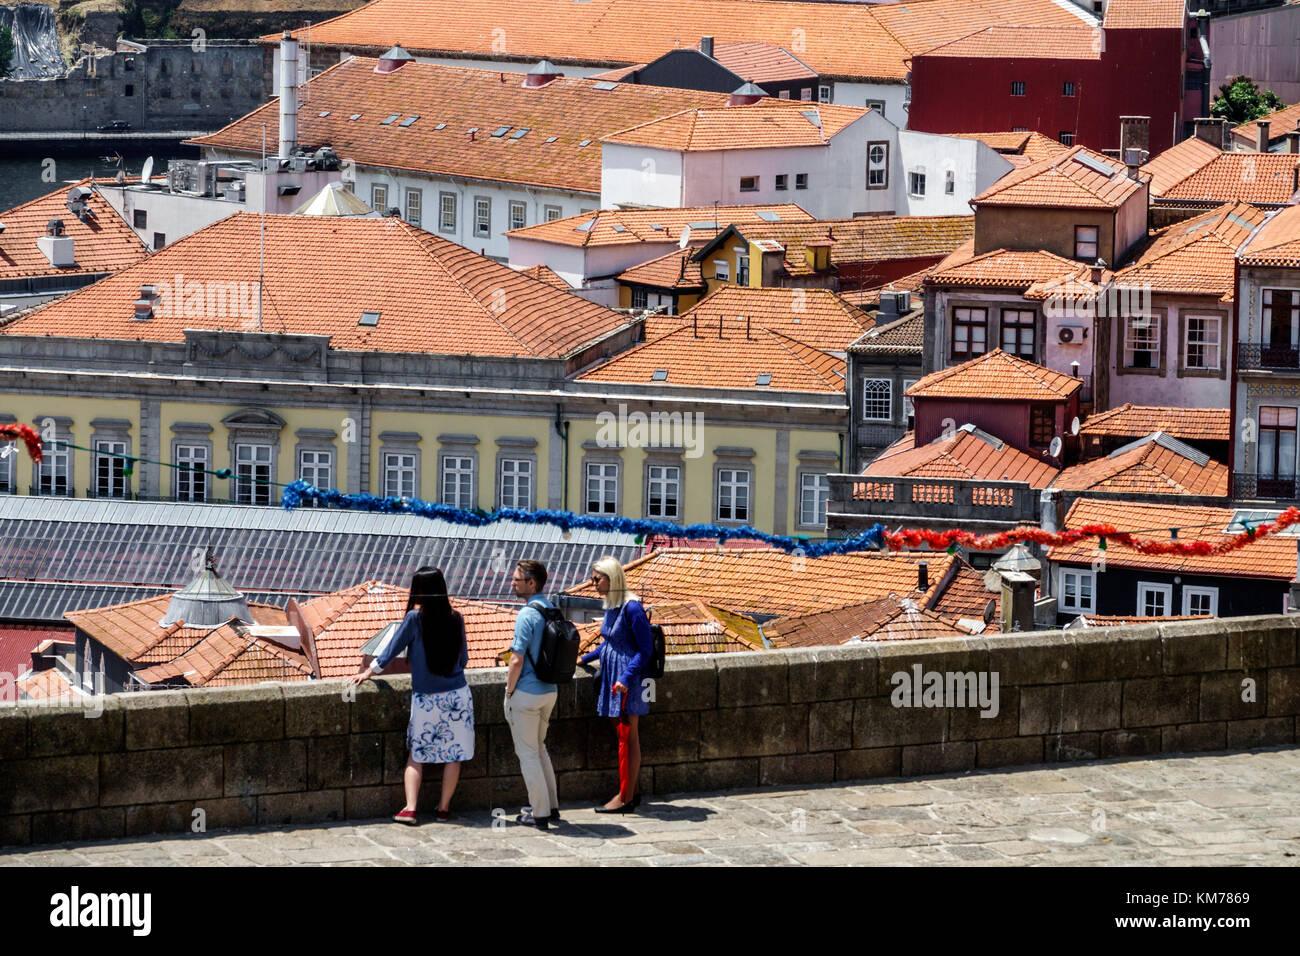 Porto Portugal Douro River Barrio La Ribeira historic center residential apartment building city skyline rooftops - Stock Image